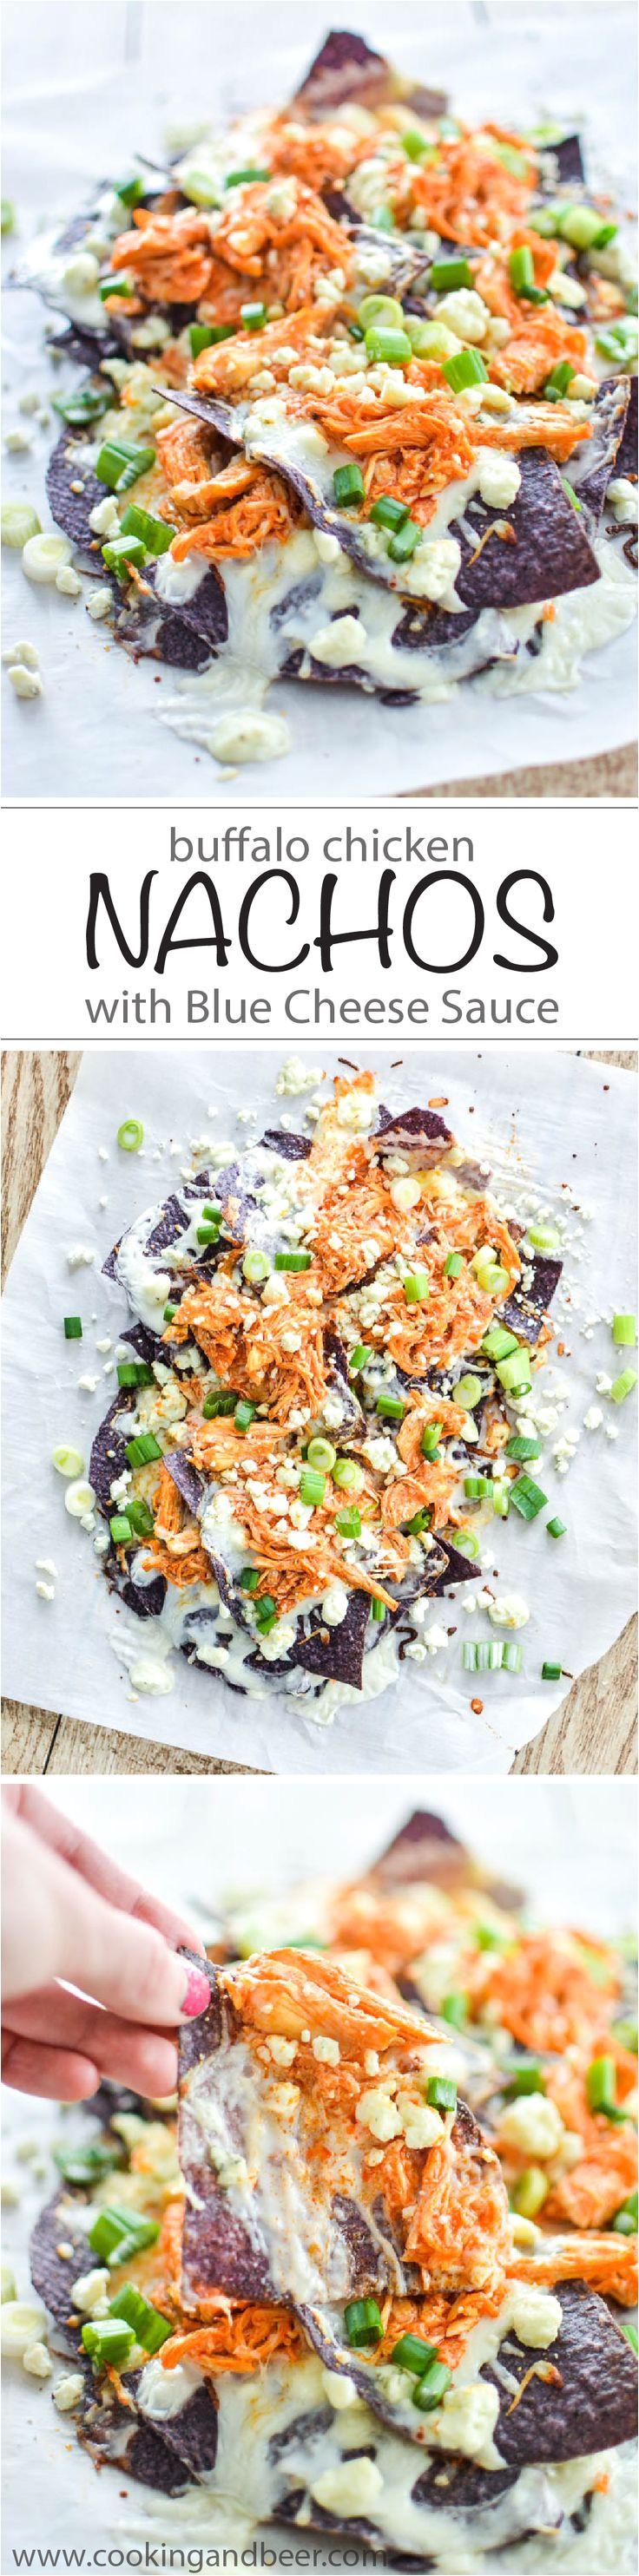 buffalo chicken nachos with blue cheese sauce